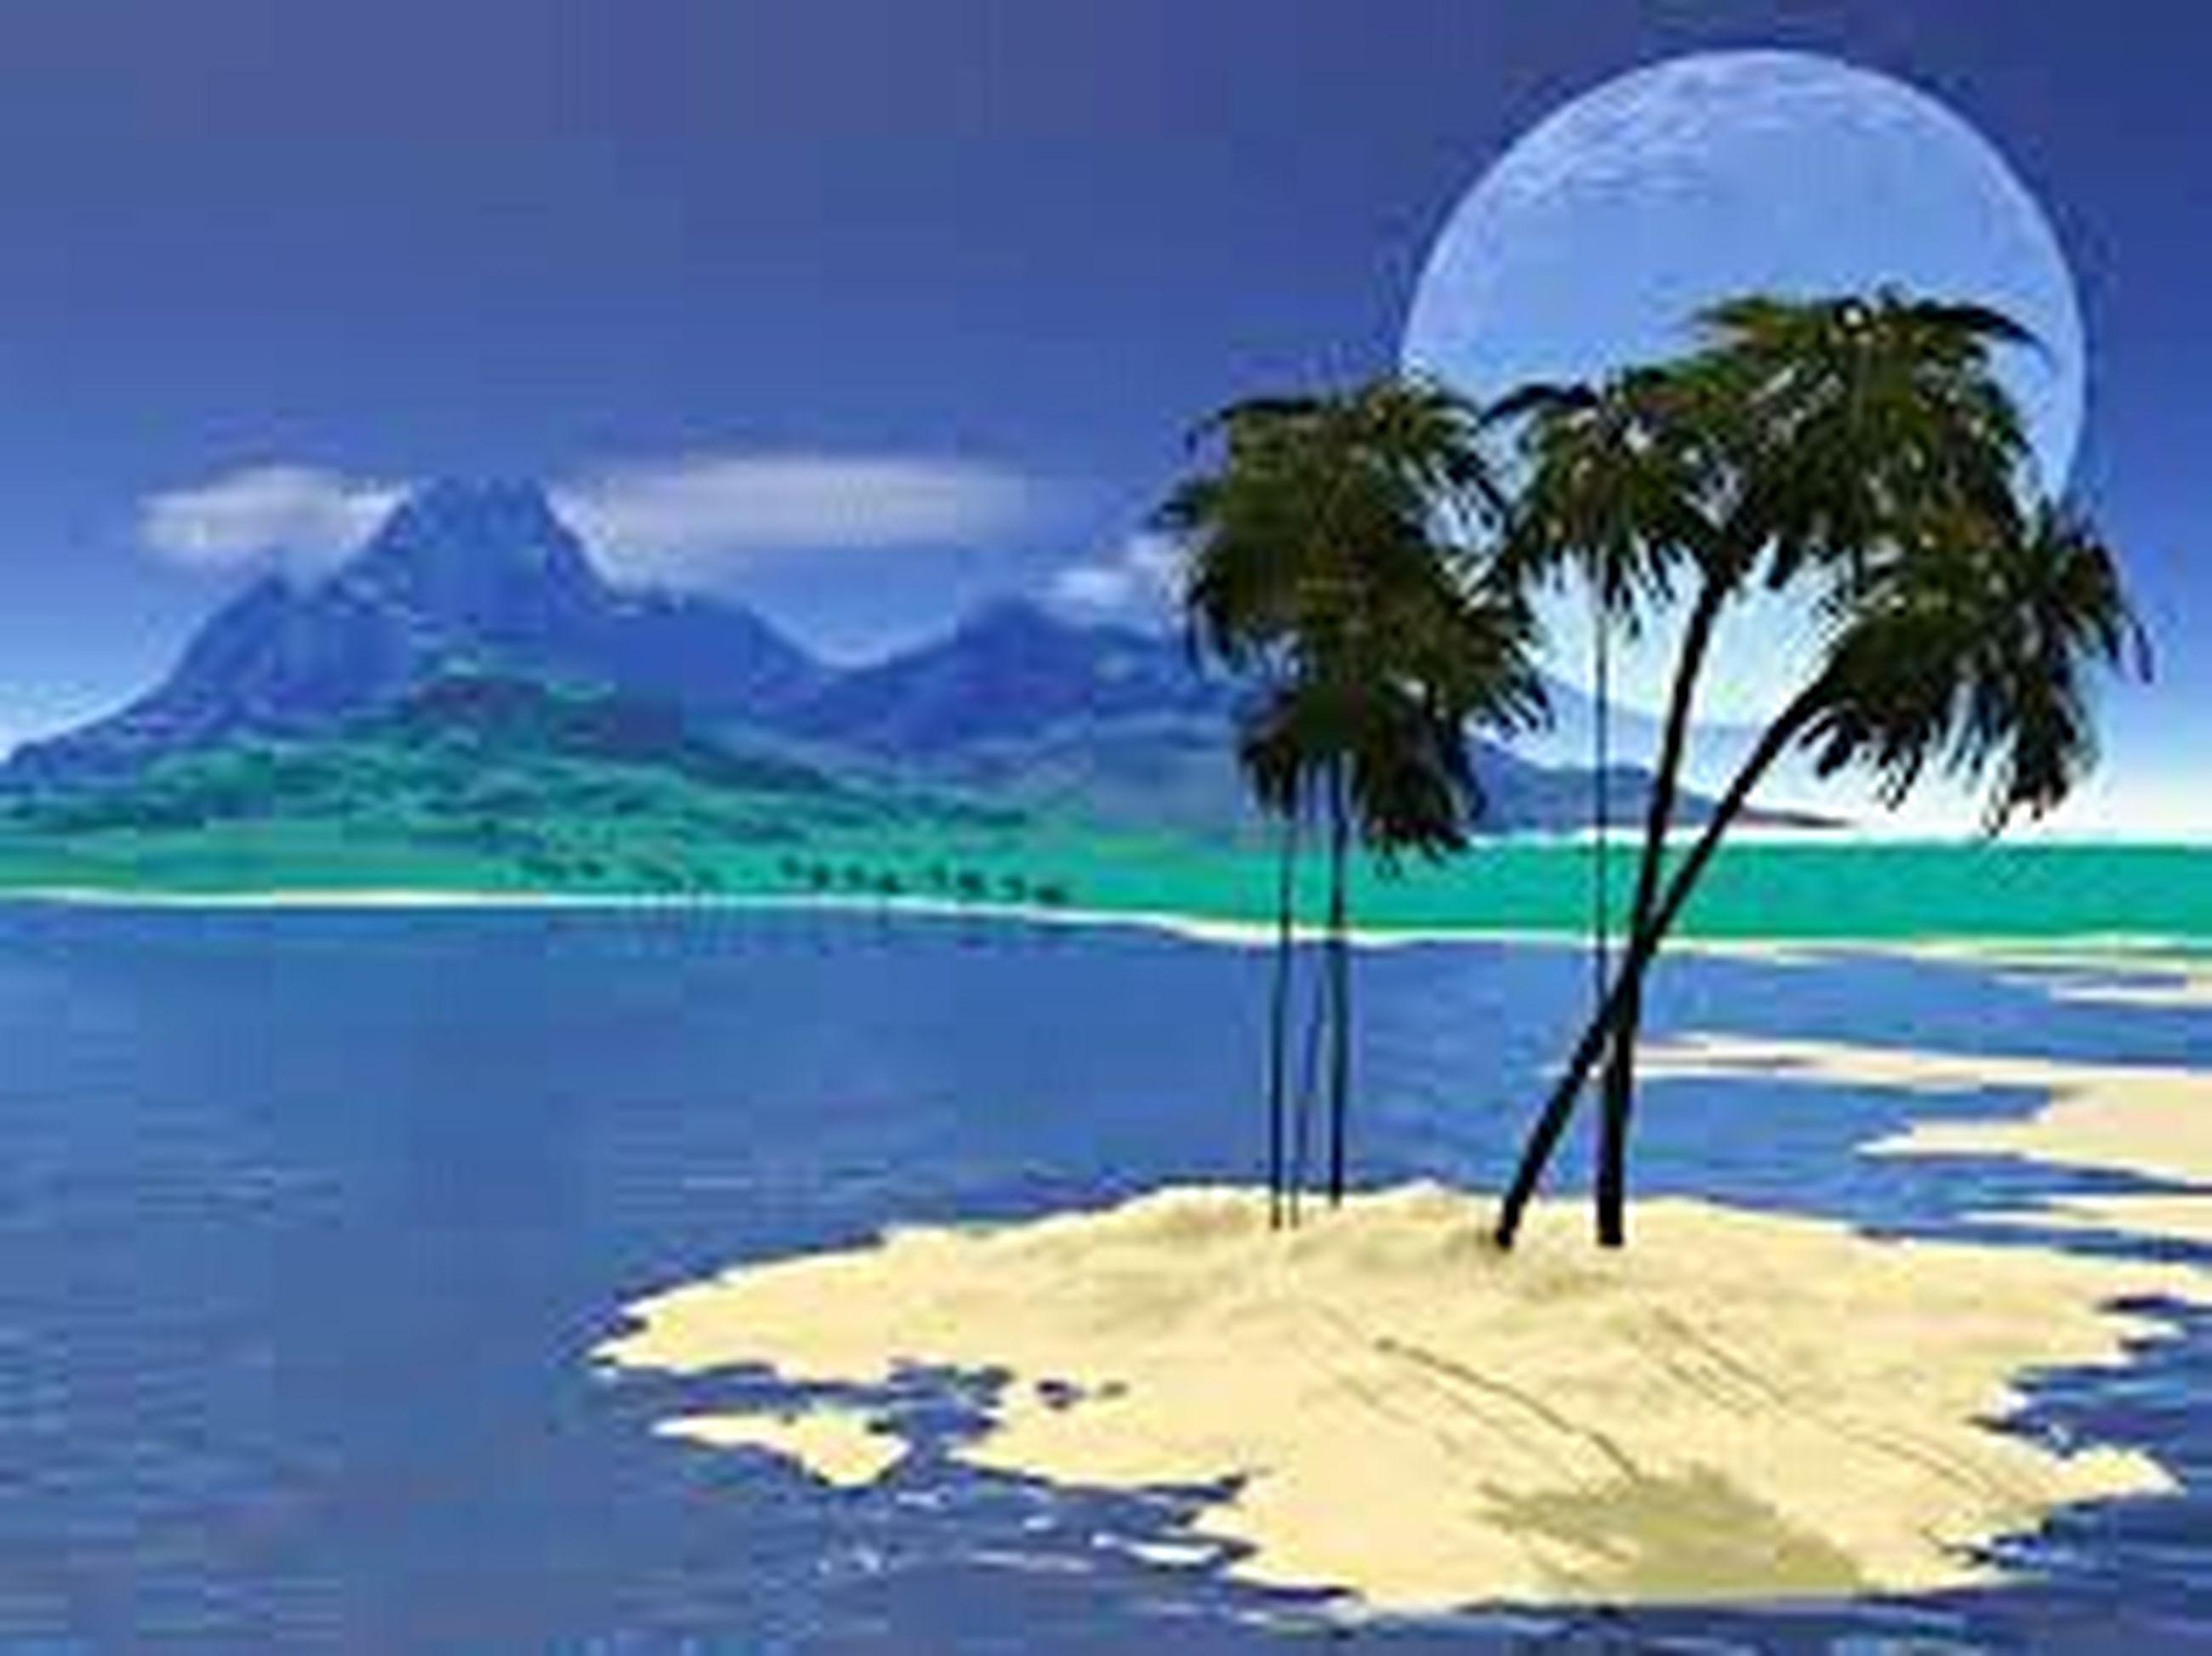 tranquil scene, tranquility, water, scenics, sea, palm tree, tree, blue, mountain, beauty in nature, sky, nature, beach, idyllic, day, cloud, non-urban scene, growth, sunlight, shore